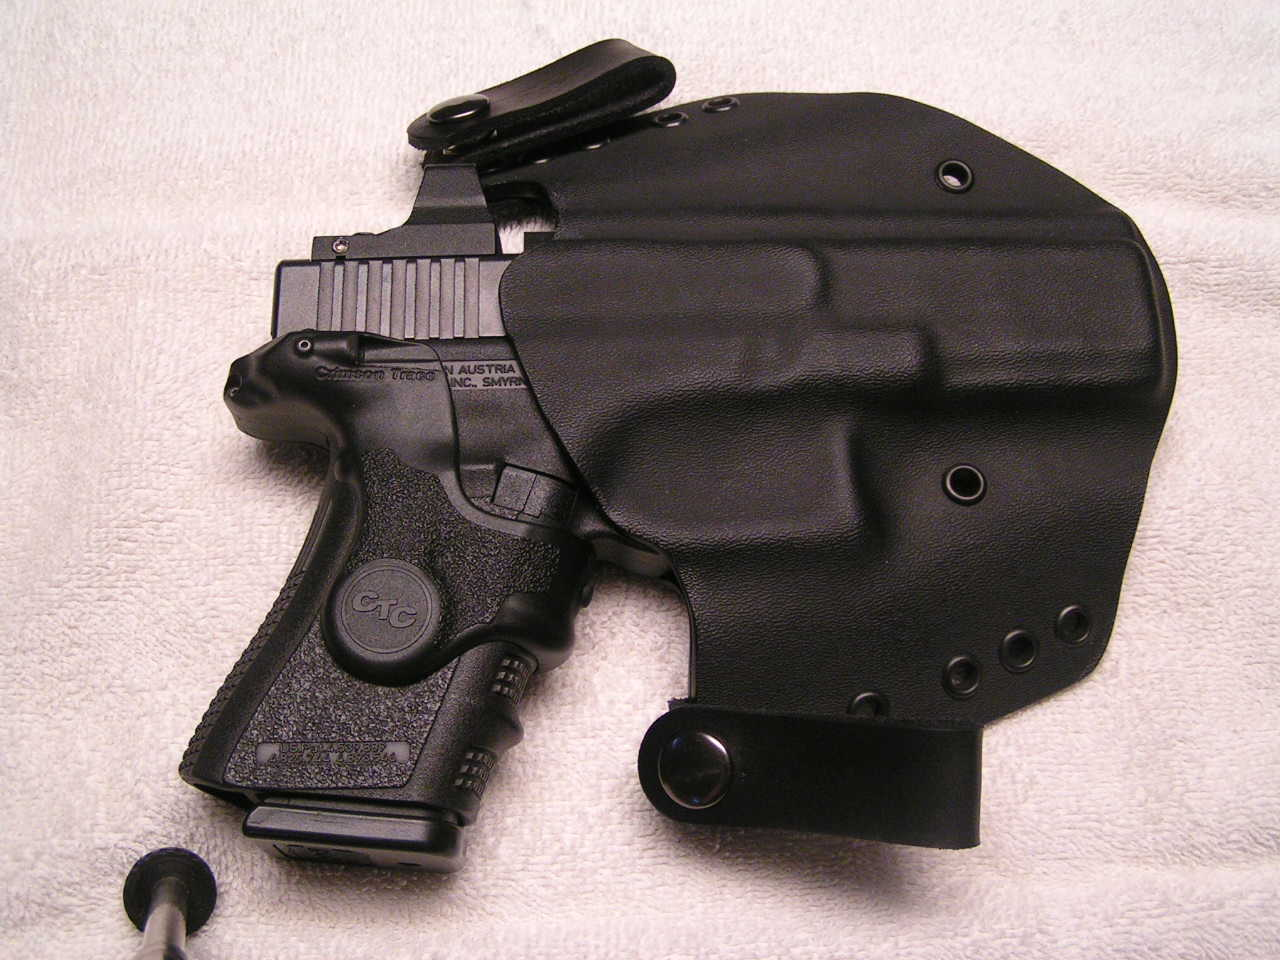 Glock 19 - 17 Photos...-midworld-17-holster-004.jpg